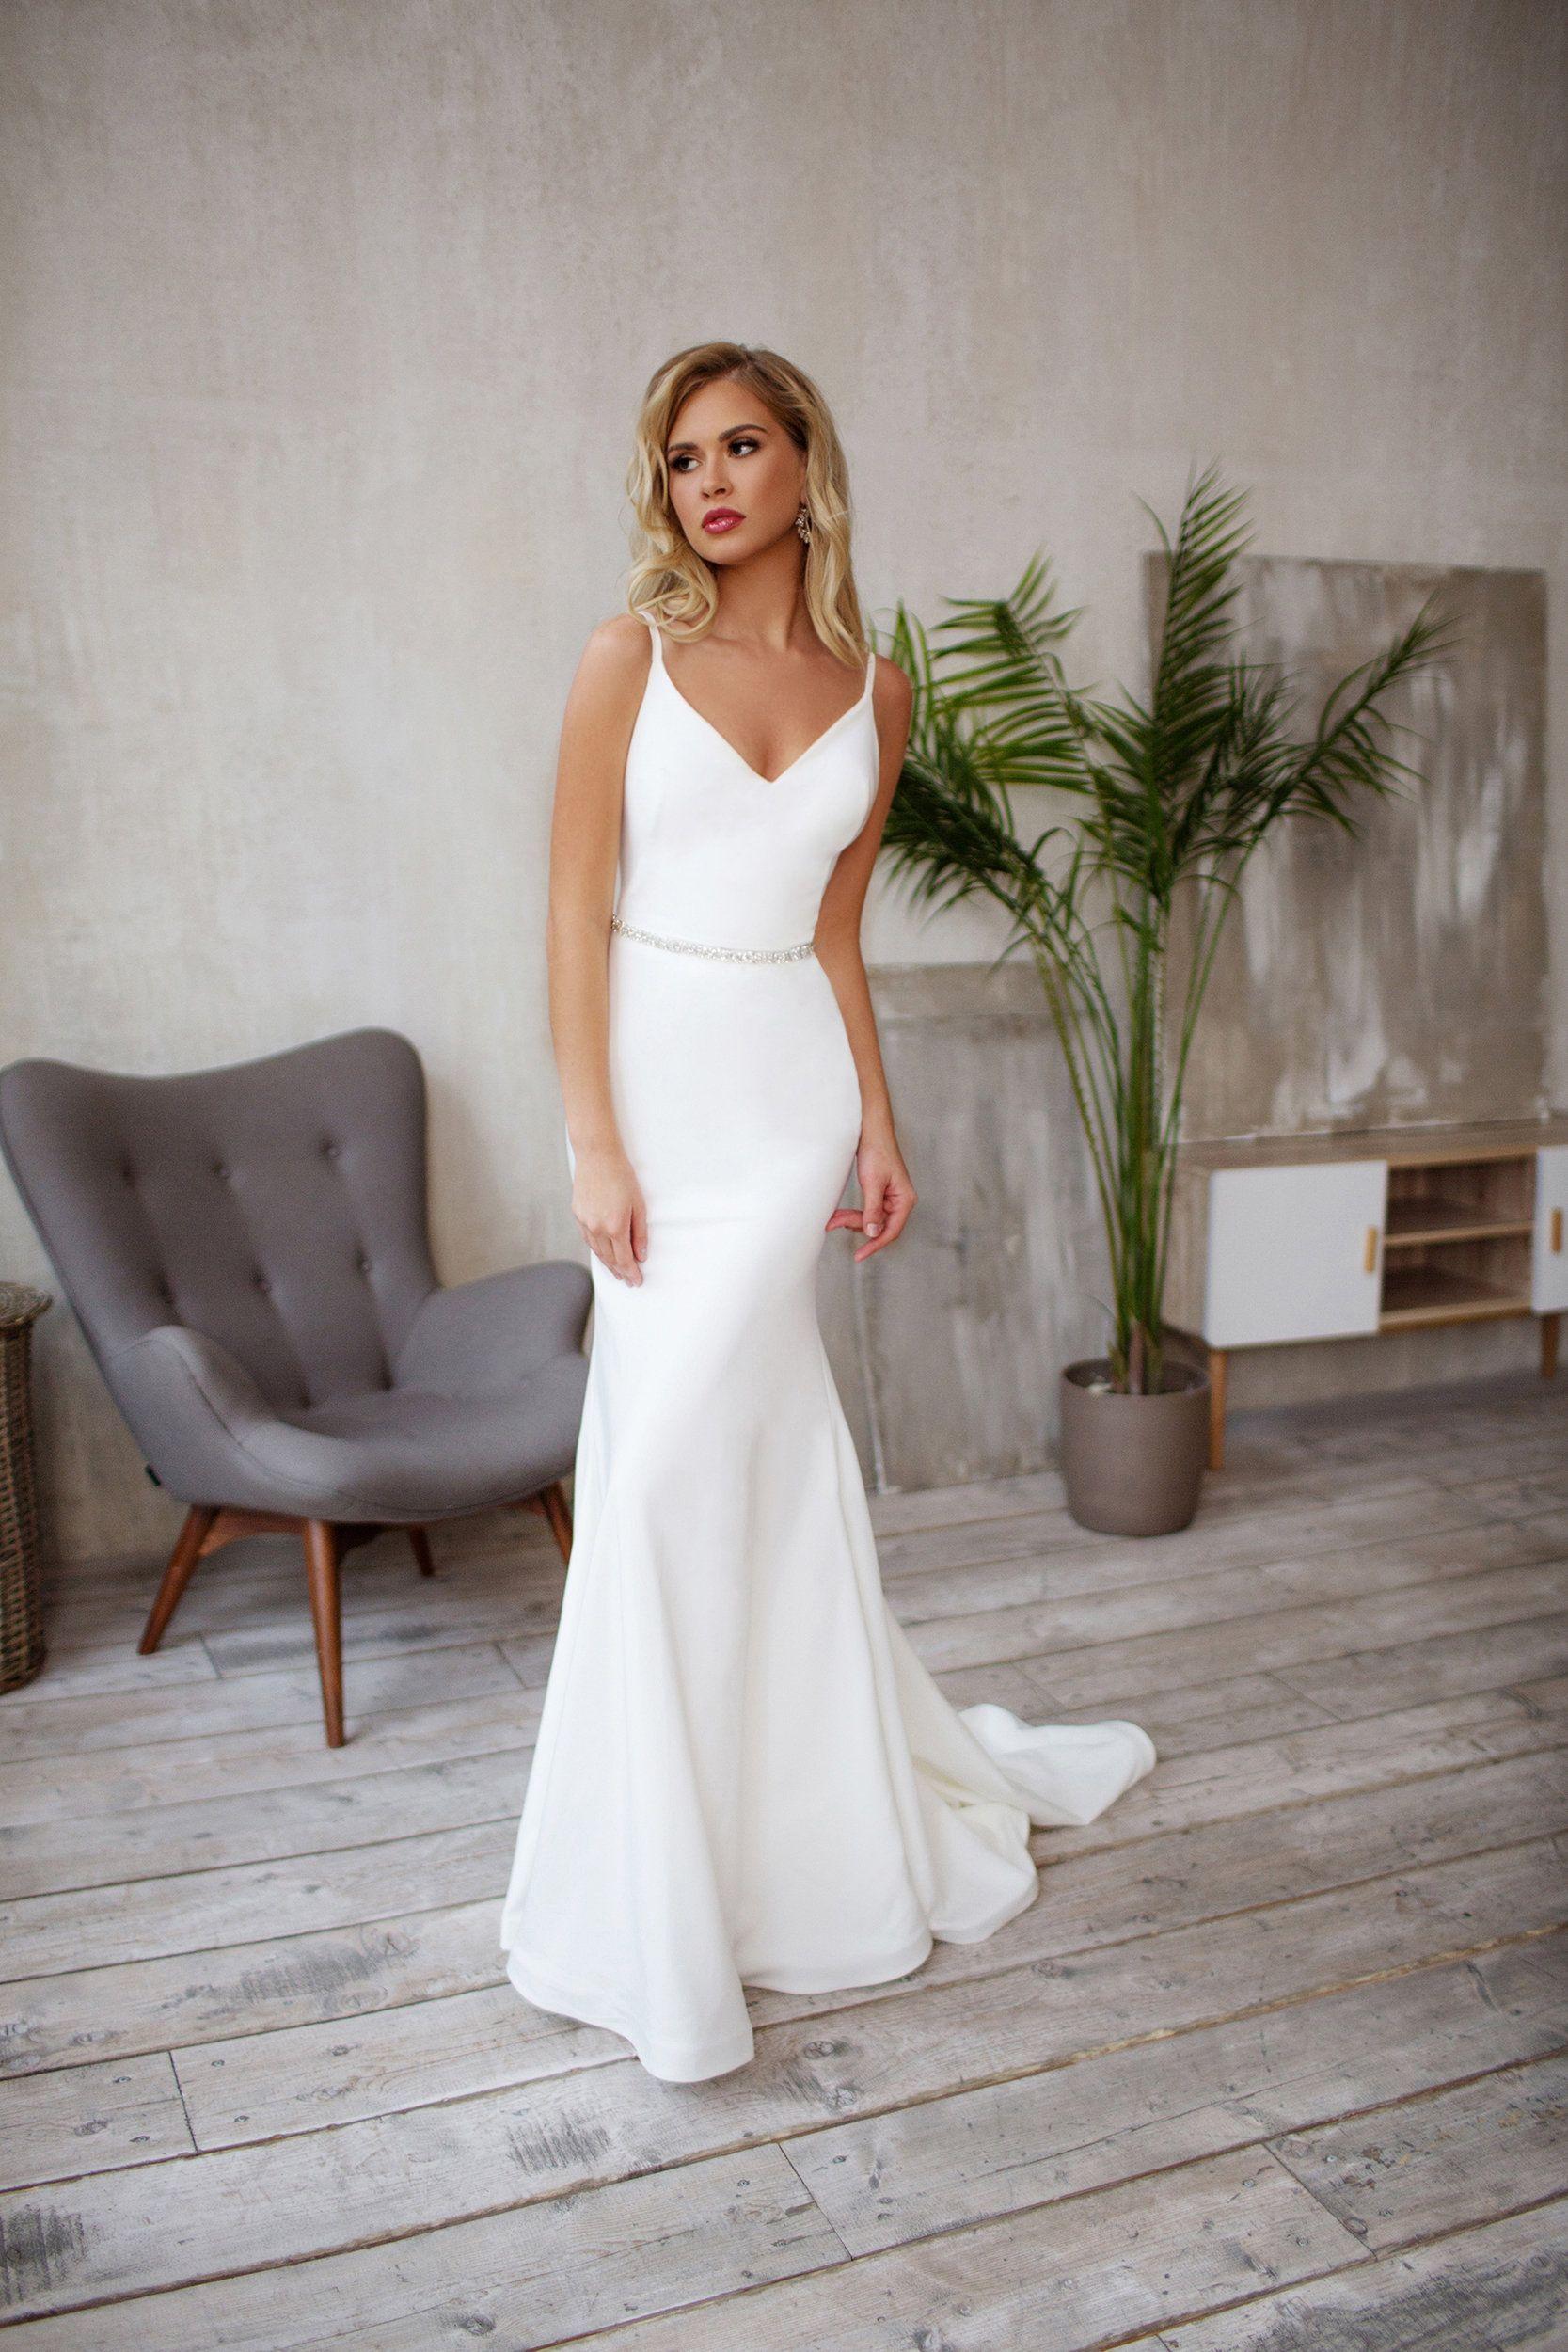 Tight wedding dress, Crepe Sleek silhouette, Minimalist bridal gown GEORGiE